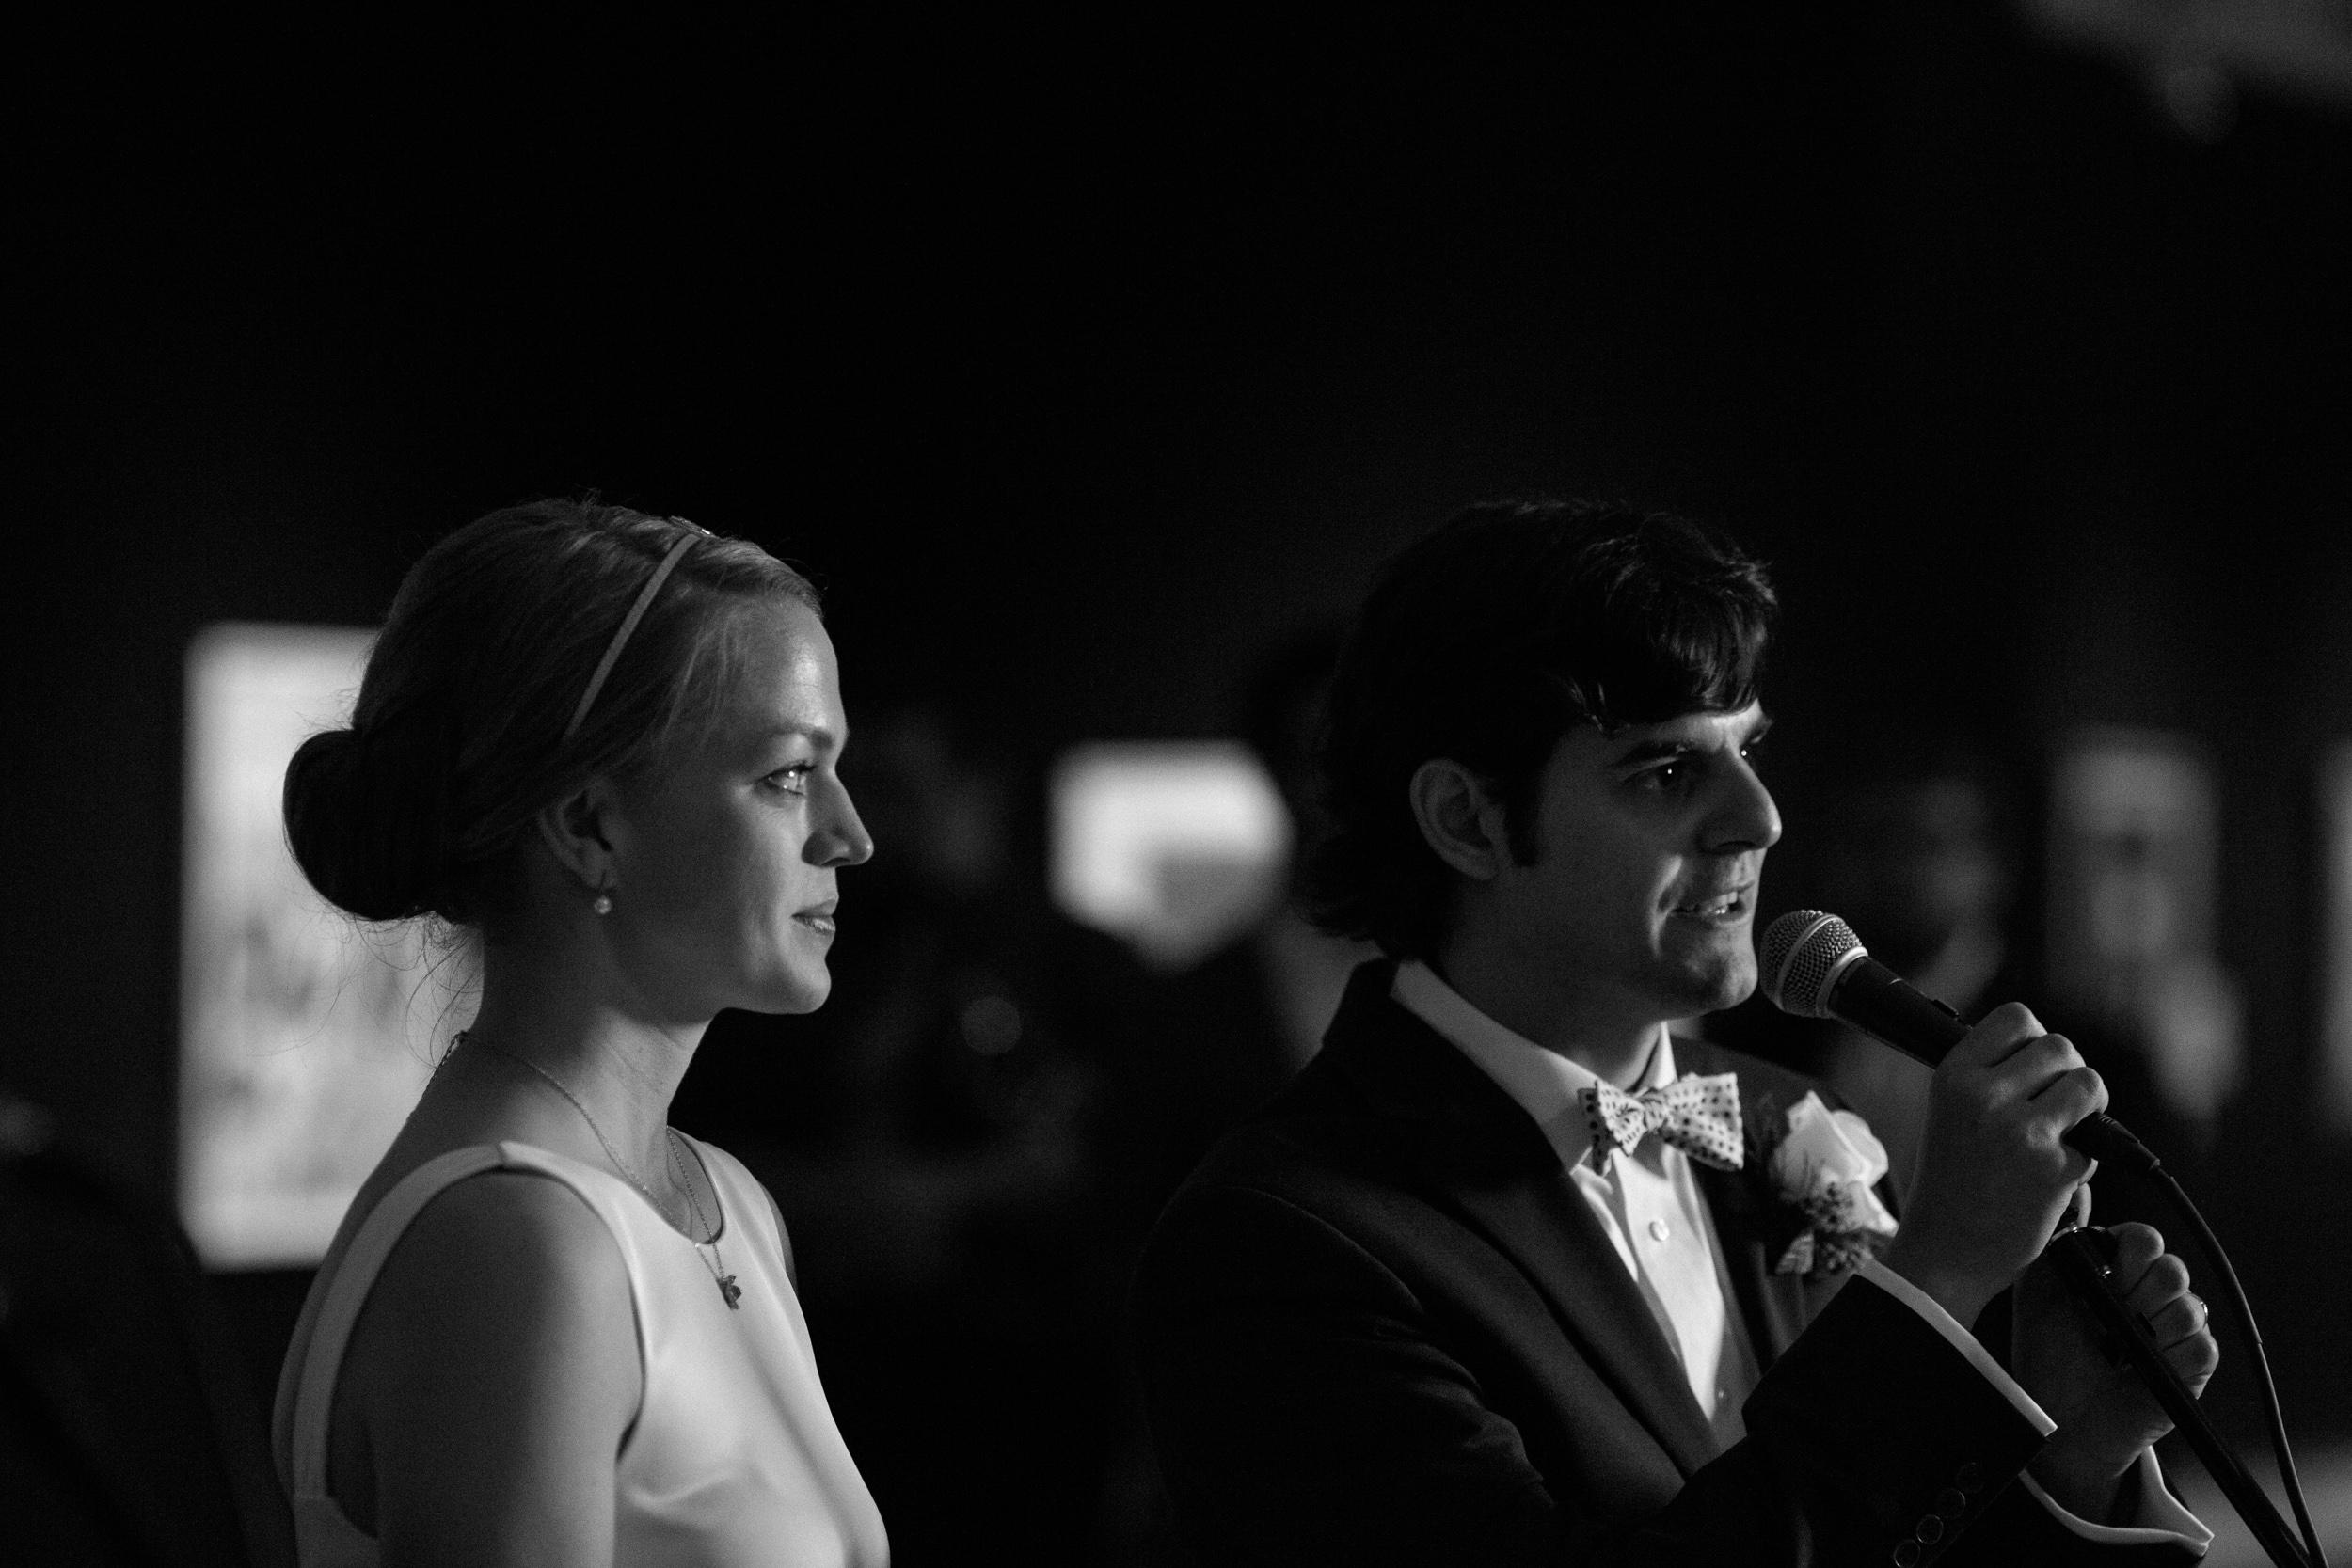 10-05-2013 maggie & adam wedding photography by brian milo-162.jpg